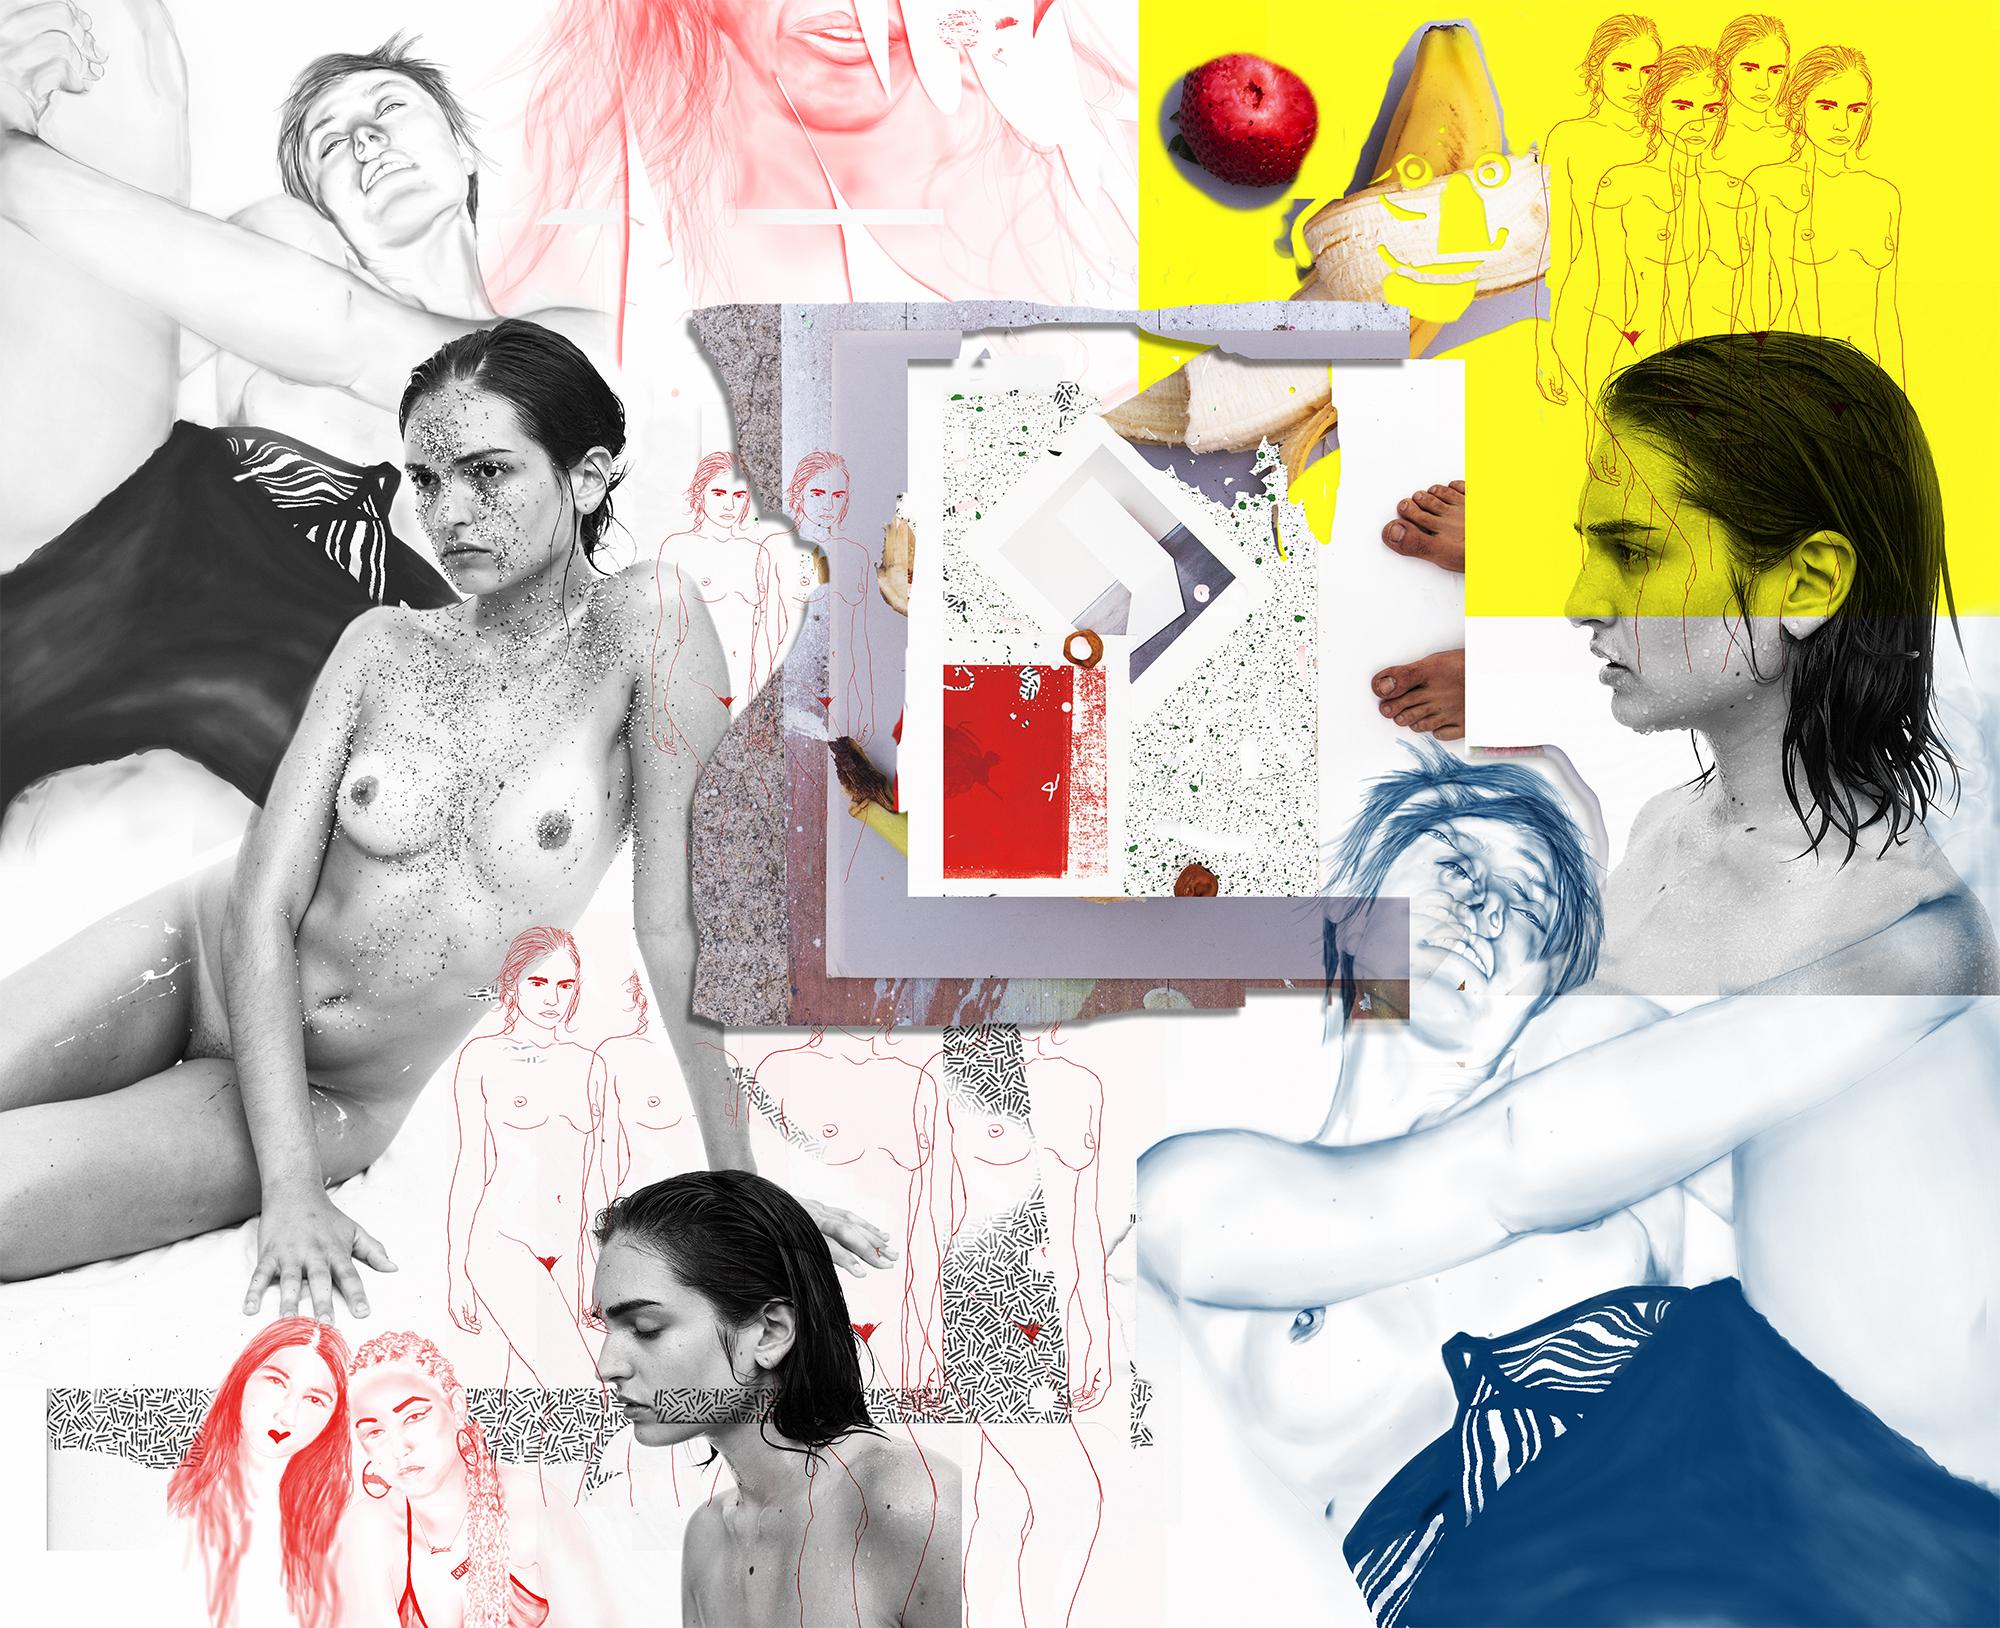 Frances, Natacha, Niki, Candy, John  Archival pigment print  Ed. 1/1 + 2 AP  177 x 145 cm  2016